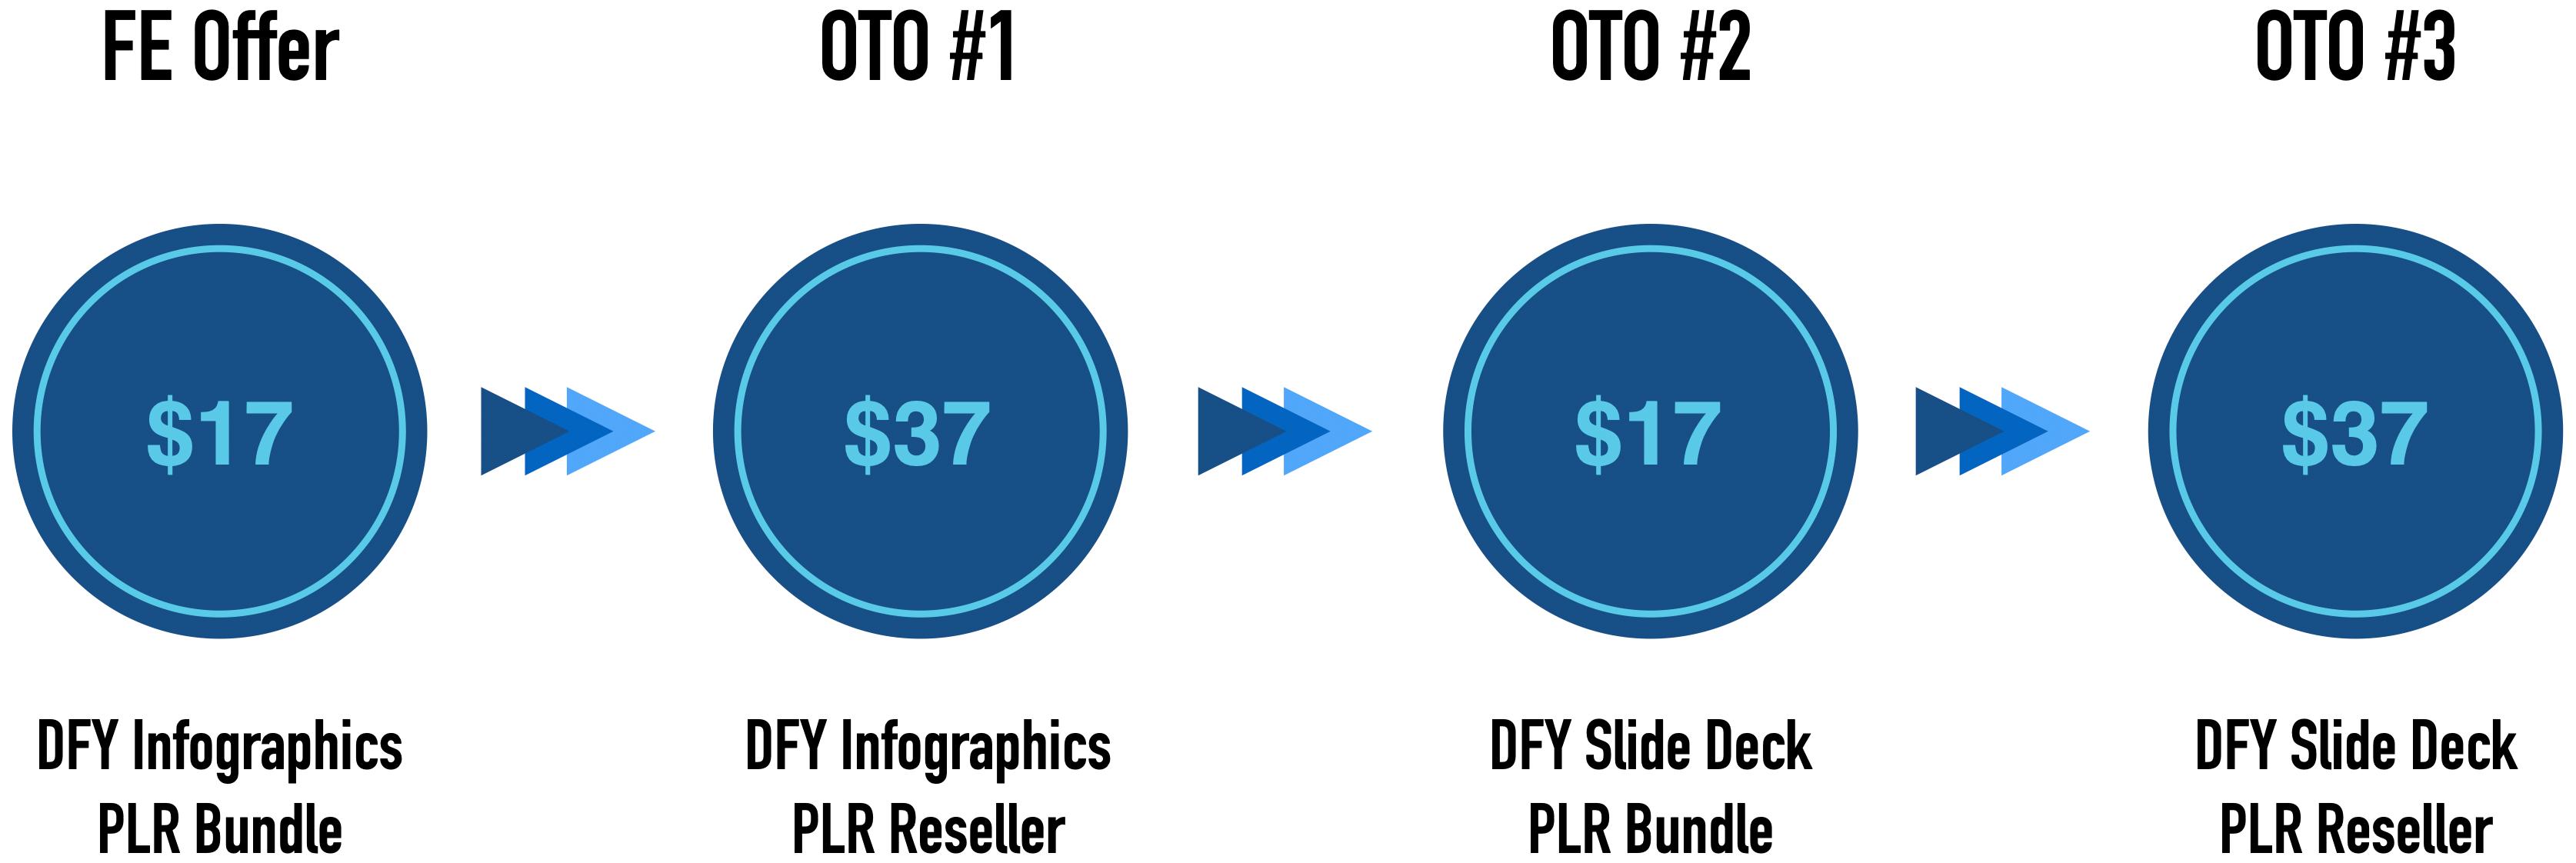 DFY-Infographics-PLR-Bundle-oto